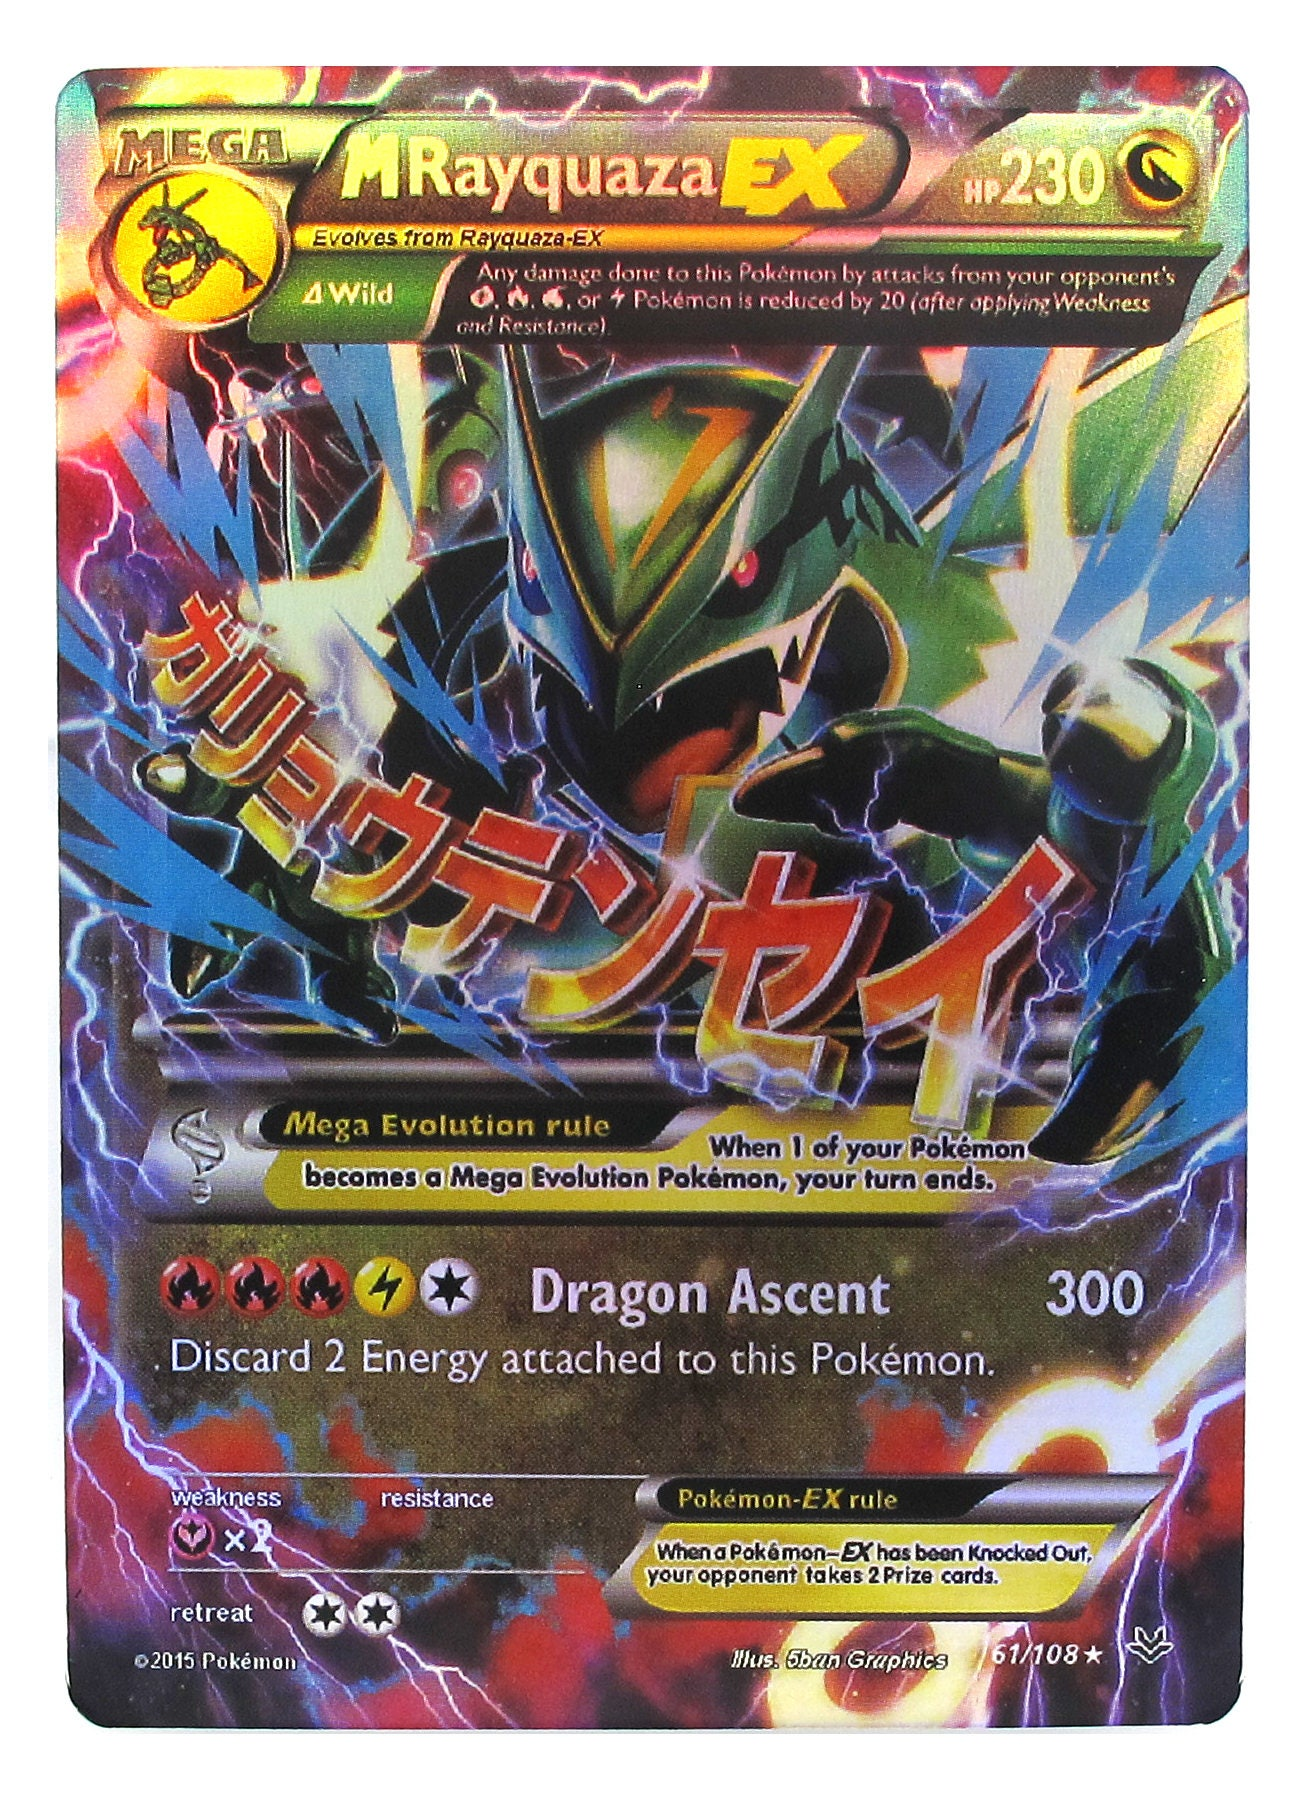 Primal Kyogre Card Handmade Pokemon Card Rayquaza Mega Ex Hp 230 With Plastic